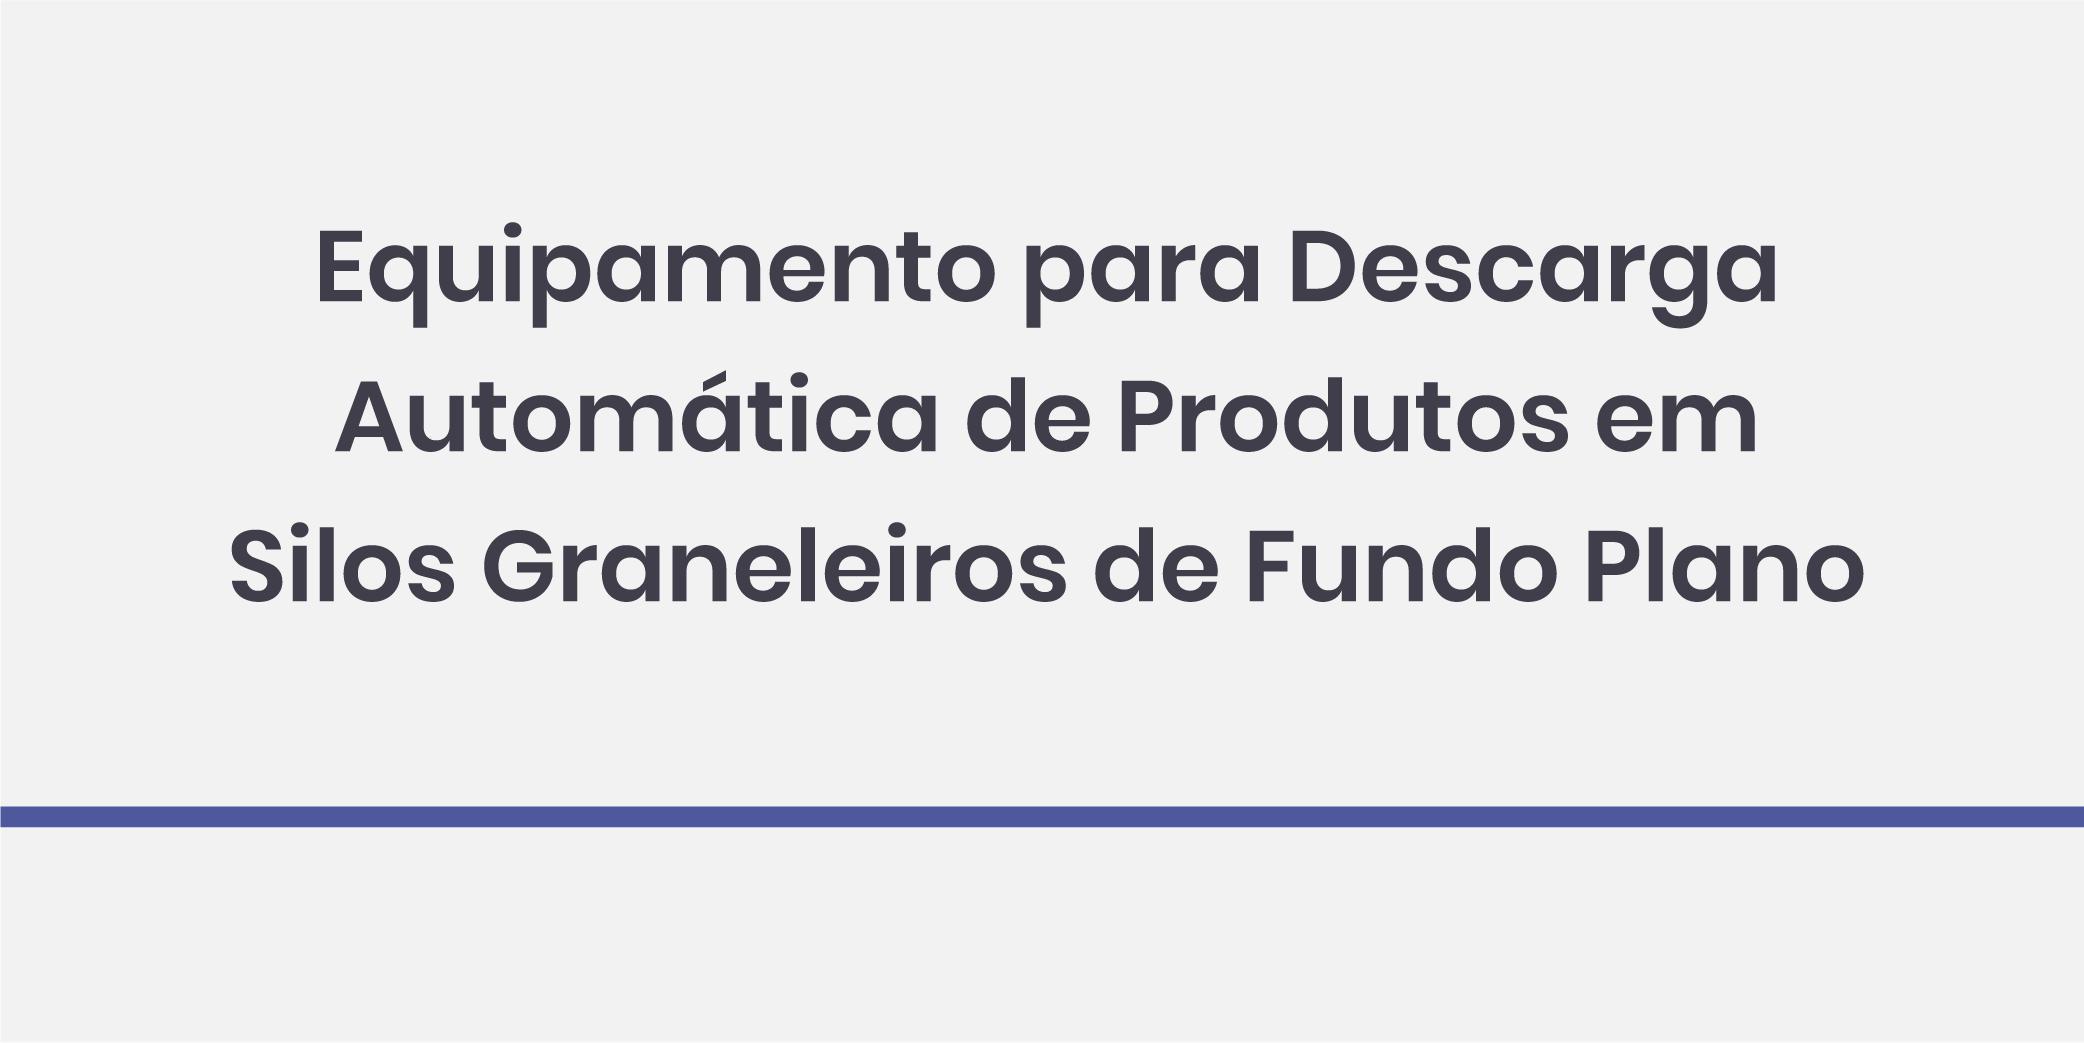 Equipamento para Descarga Automática de Produtos em Silos Graneleiros de Fundo Plano